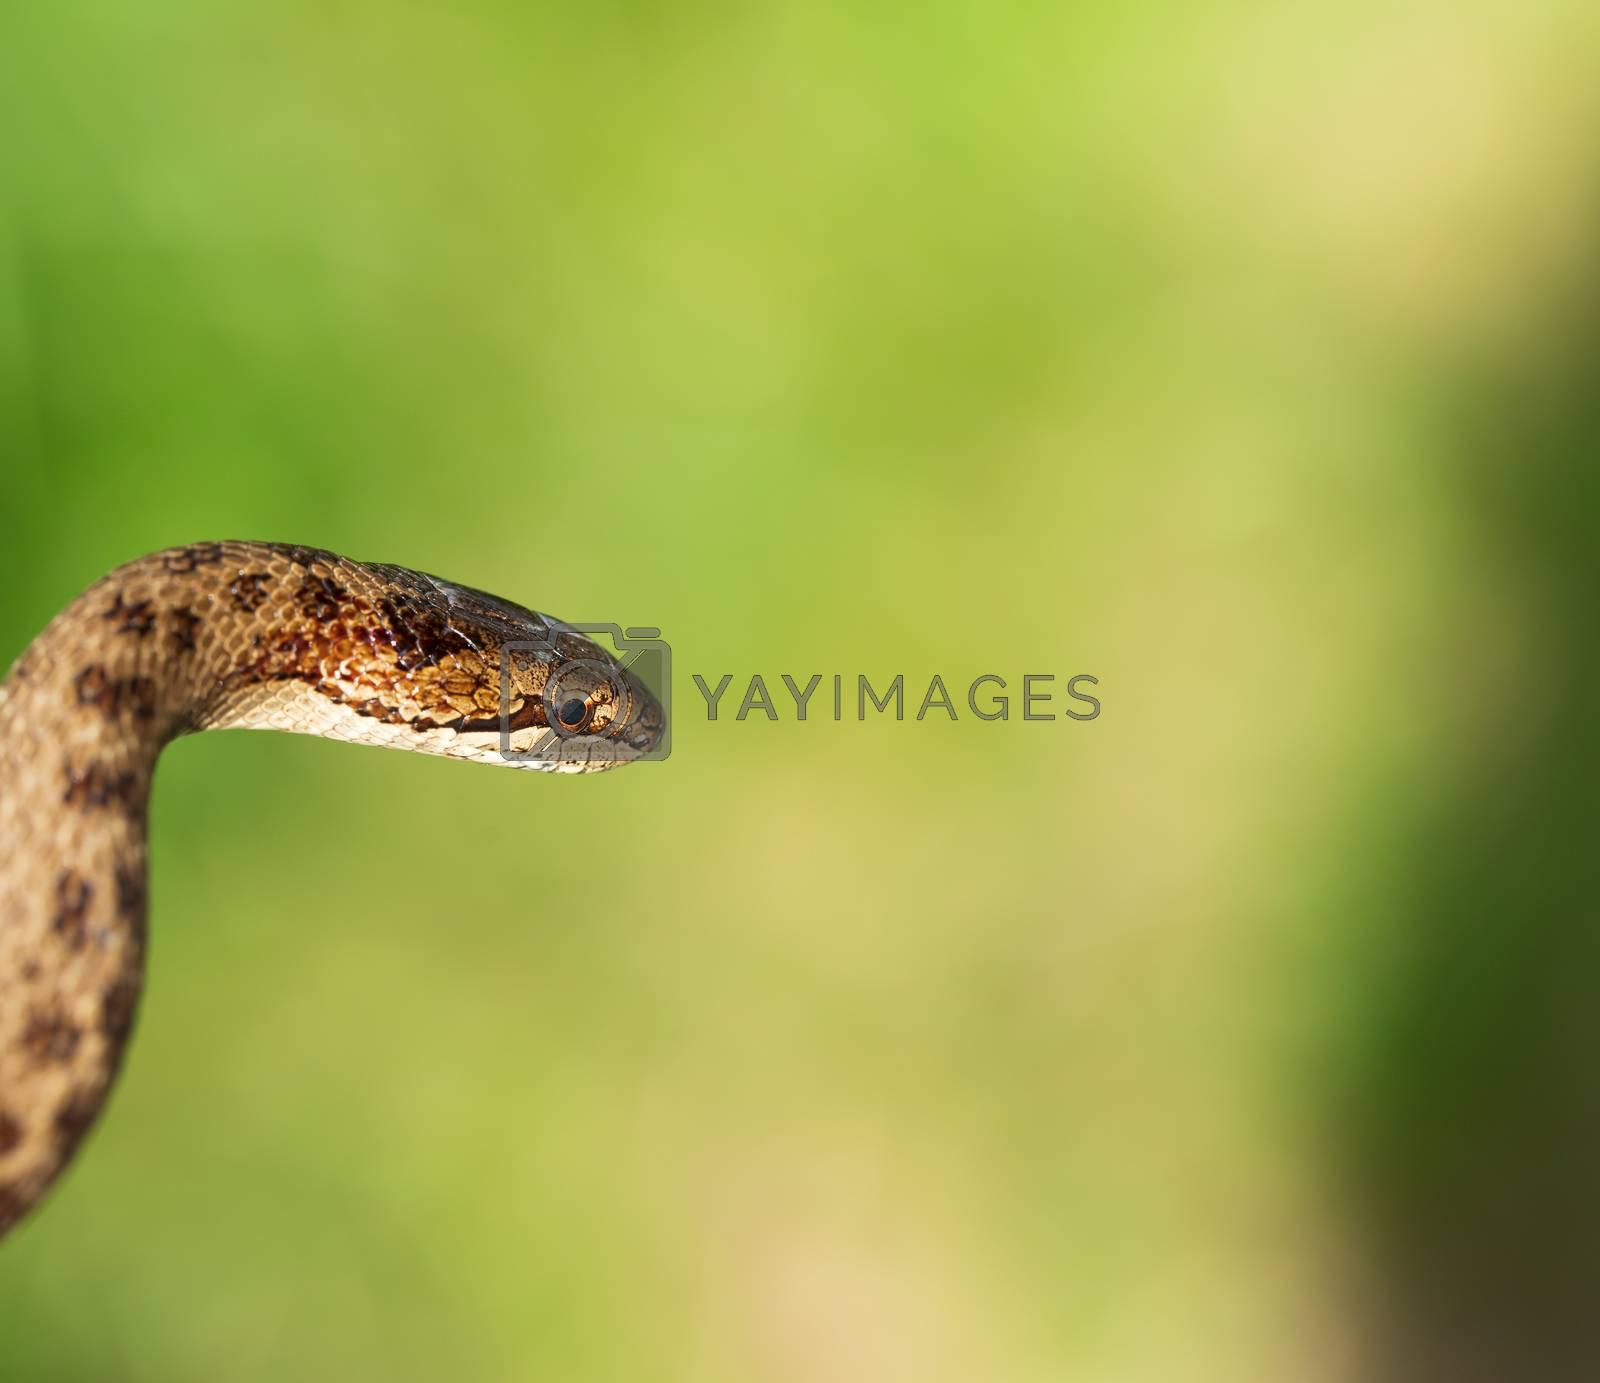 Non venomous Smooth snake, Coronella austriaca, detail of head against blurry background, Czech Republic, Europe wildlife